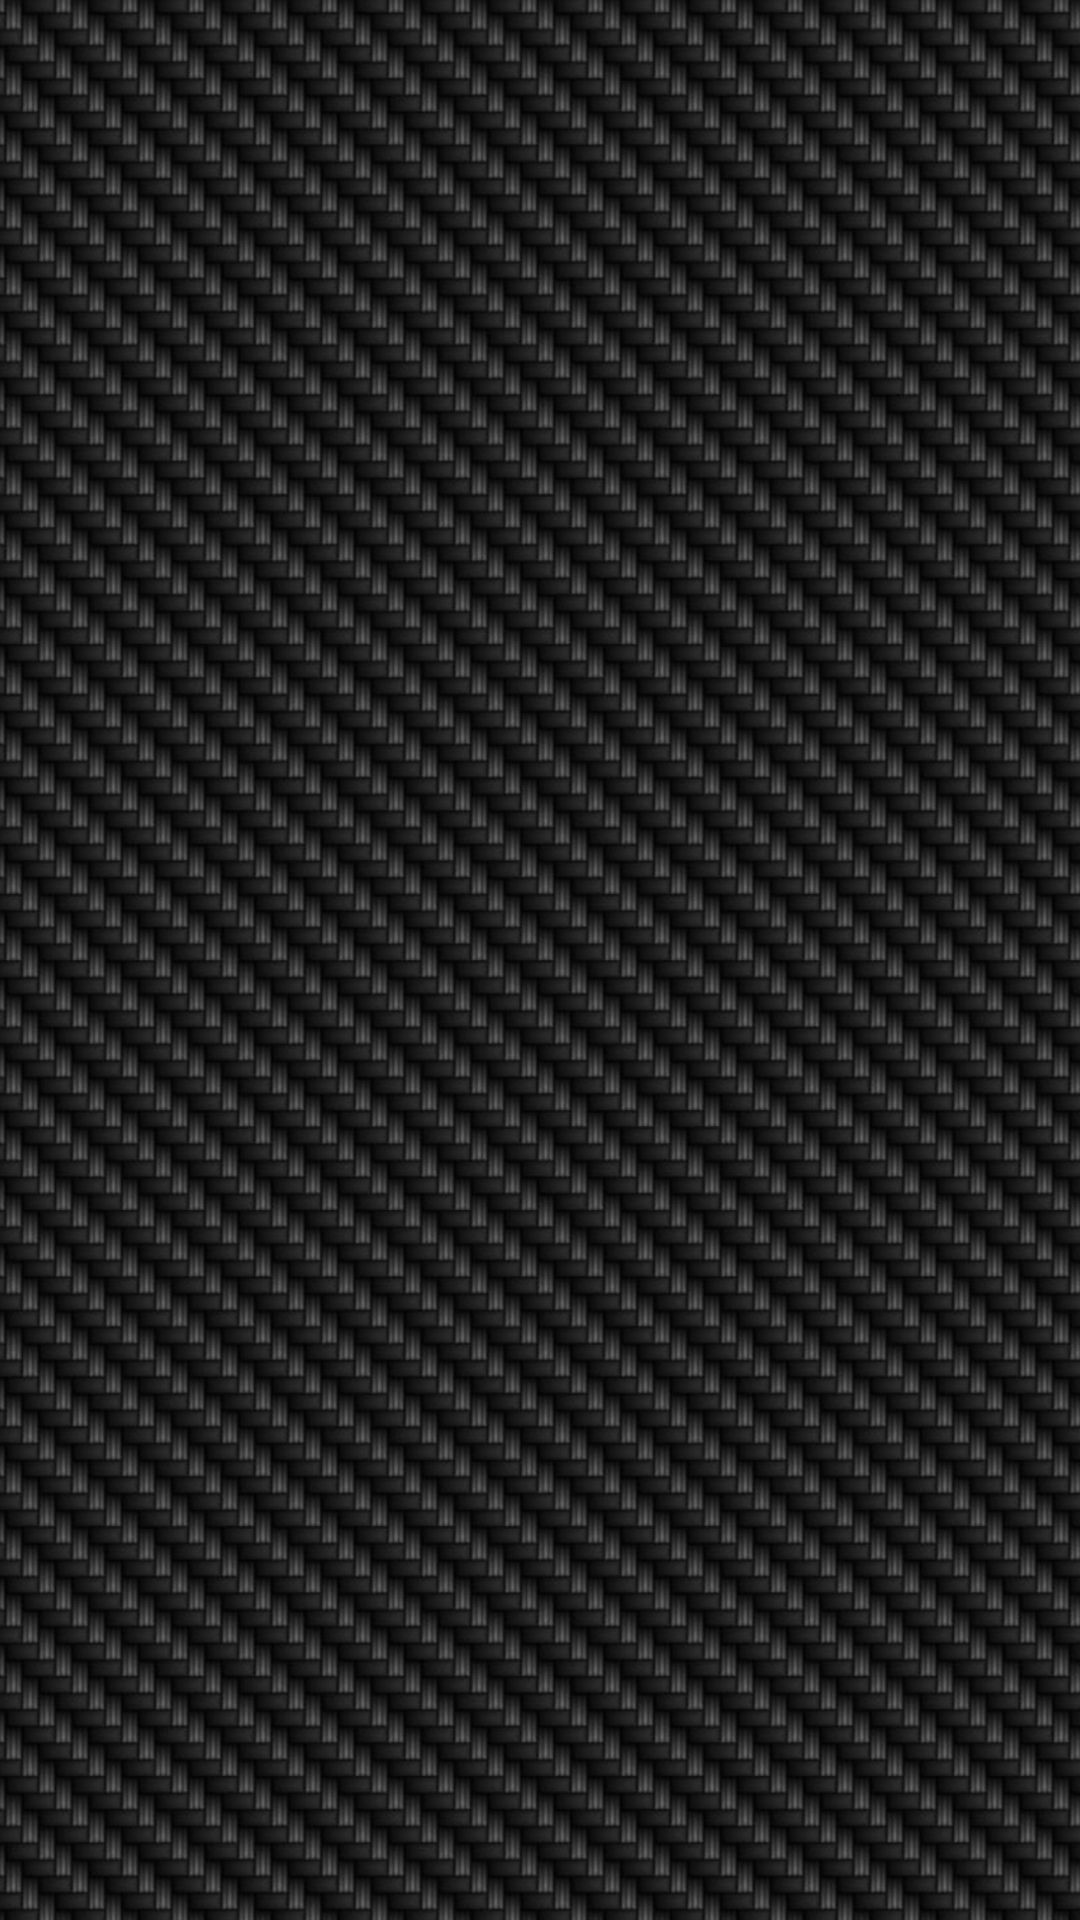 Carbon Fiber Wallpaper For Mac Computers In 2021 Mac Computer Carbon Fiber Wallpaper Carbon Fiber